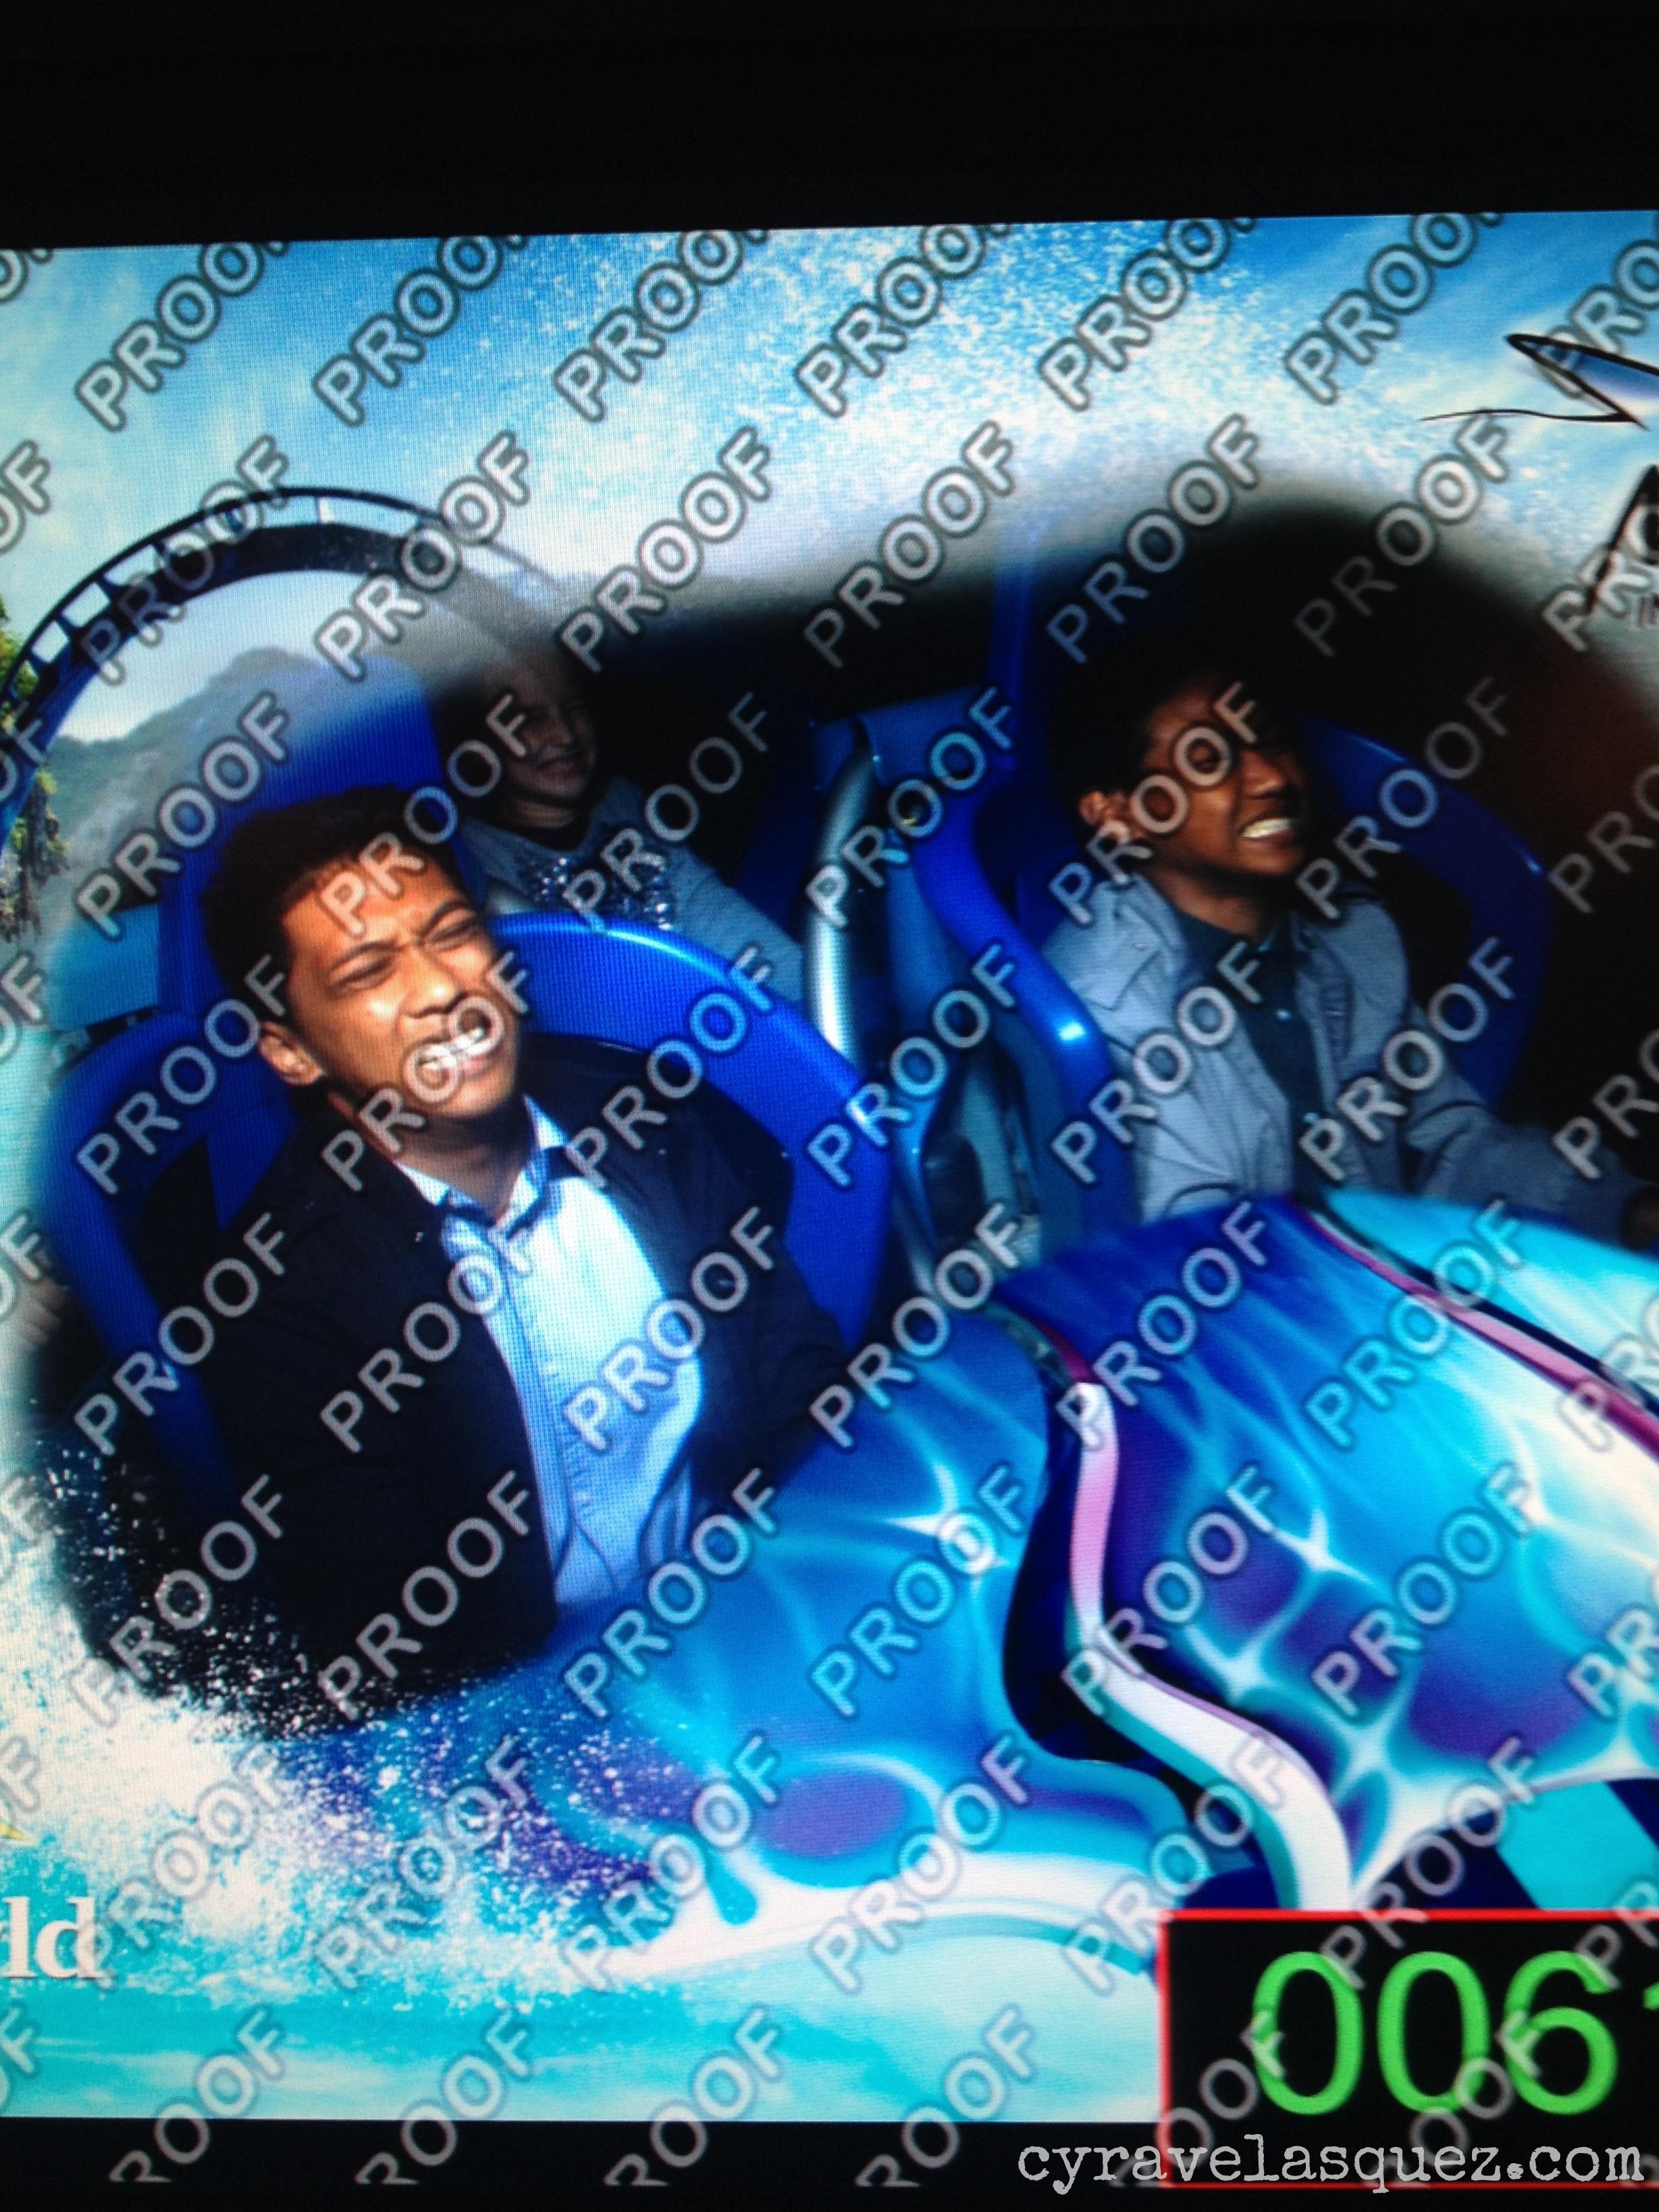 Derek and Brennan Velasquez riding the Manta at SeaWorld San Diego.